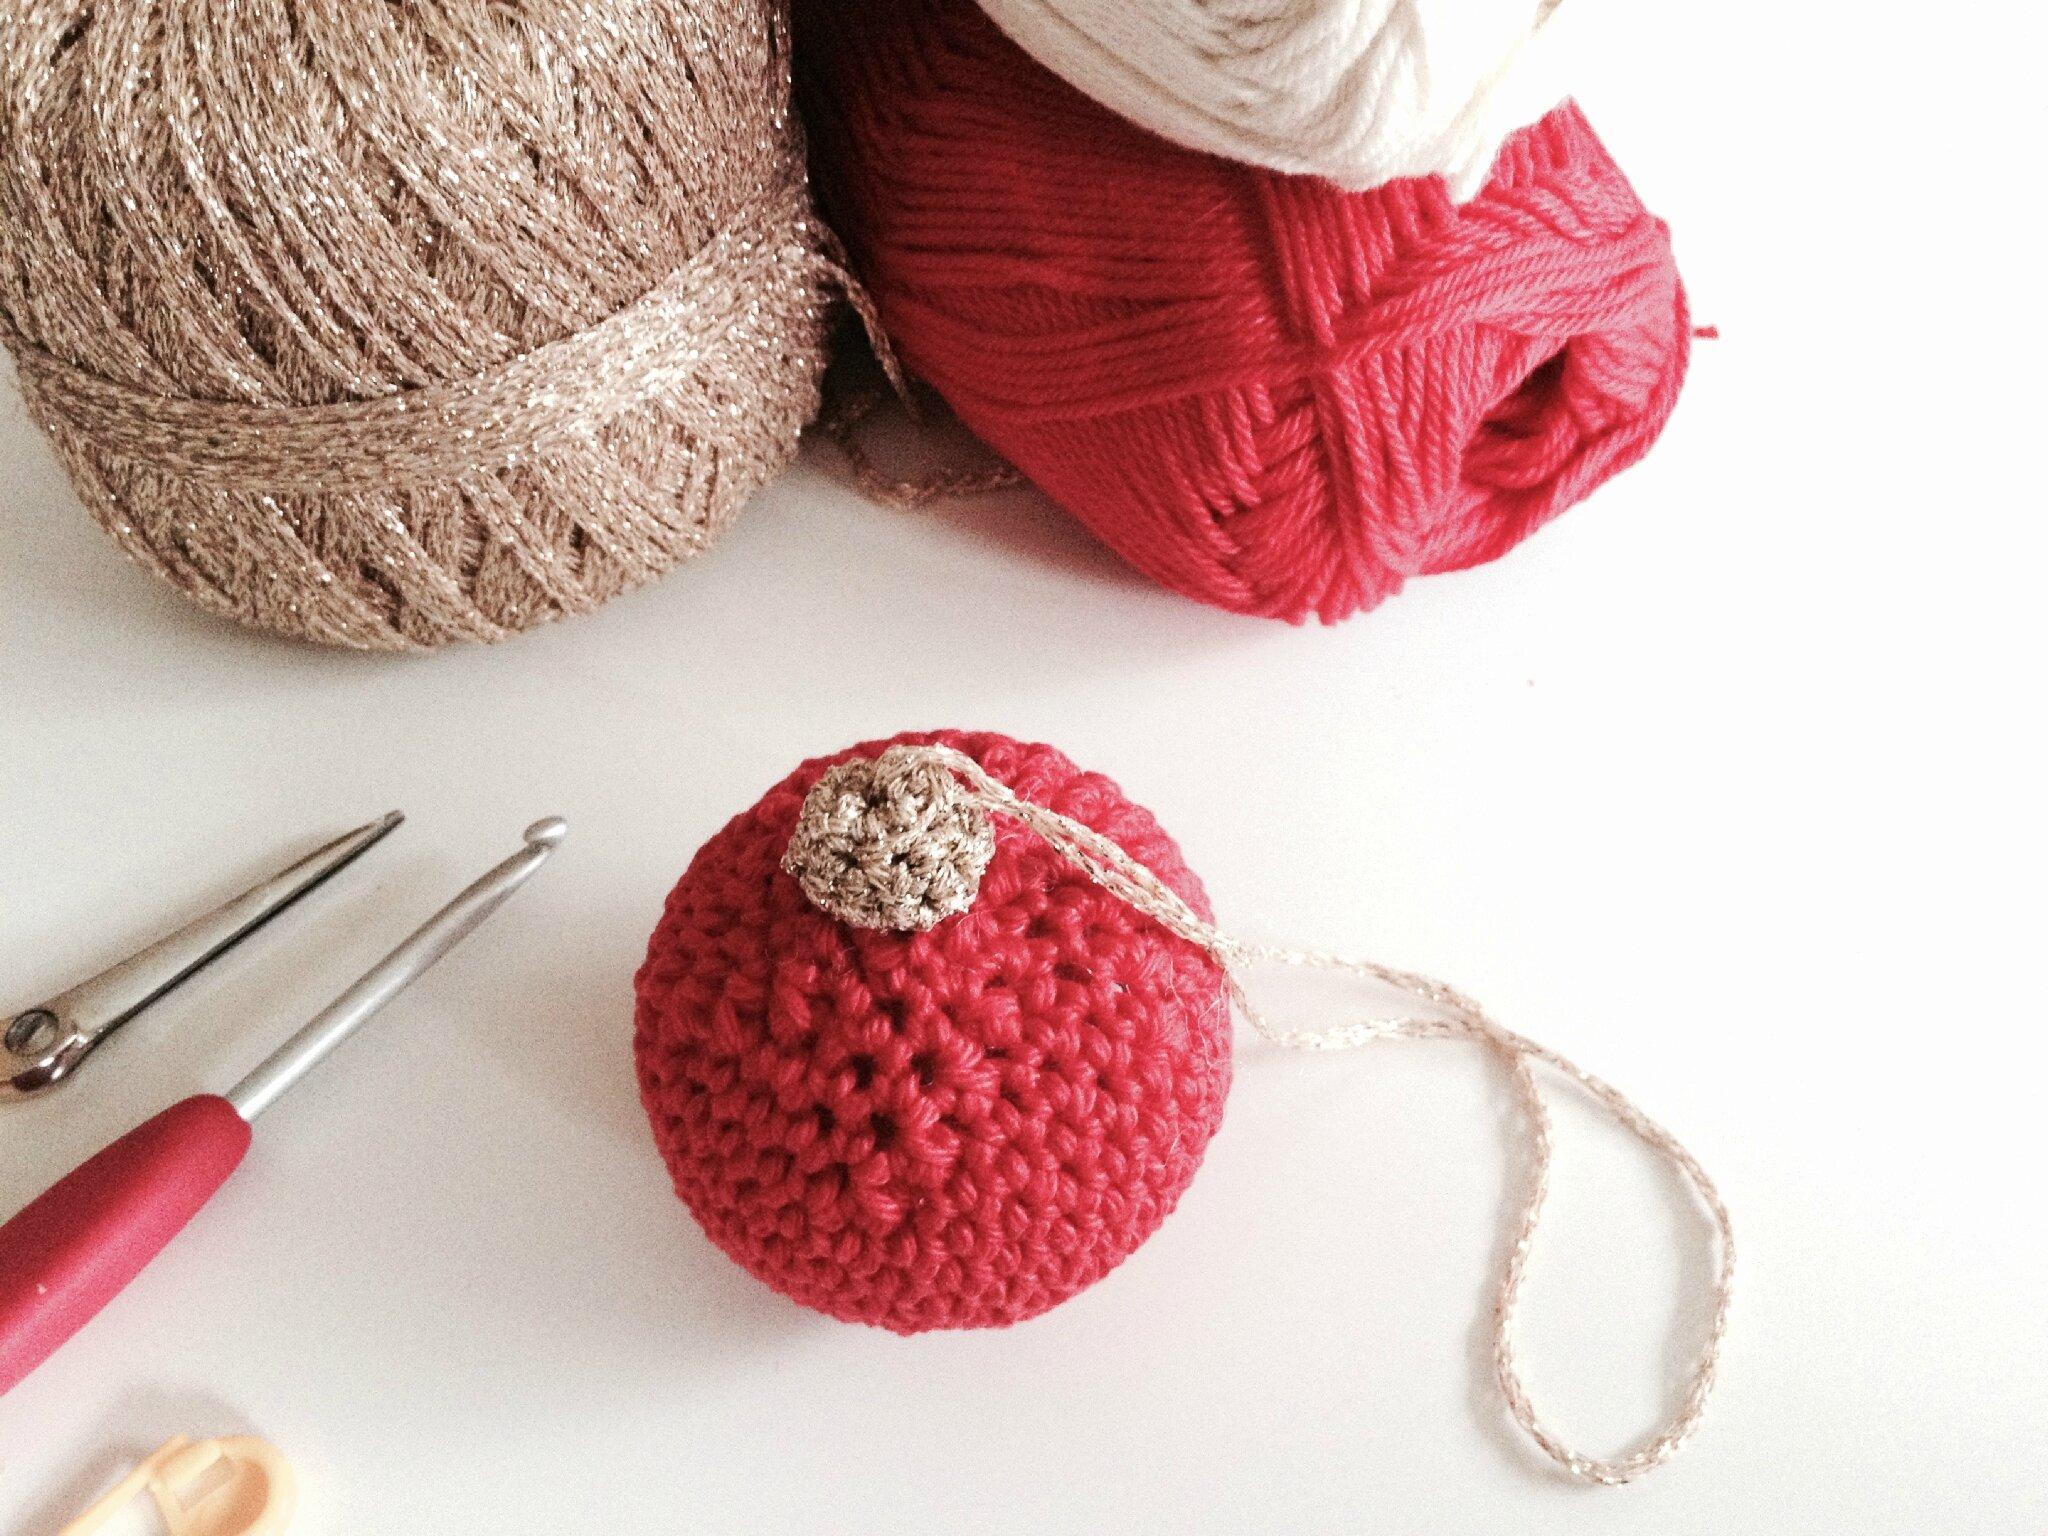 Boules De Noel Au Crochet Les Ateliers Kokoboheme